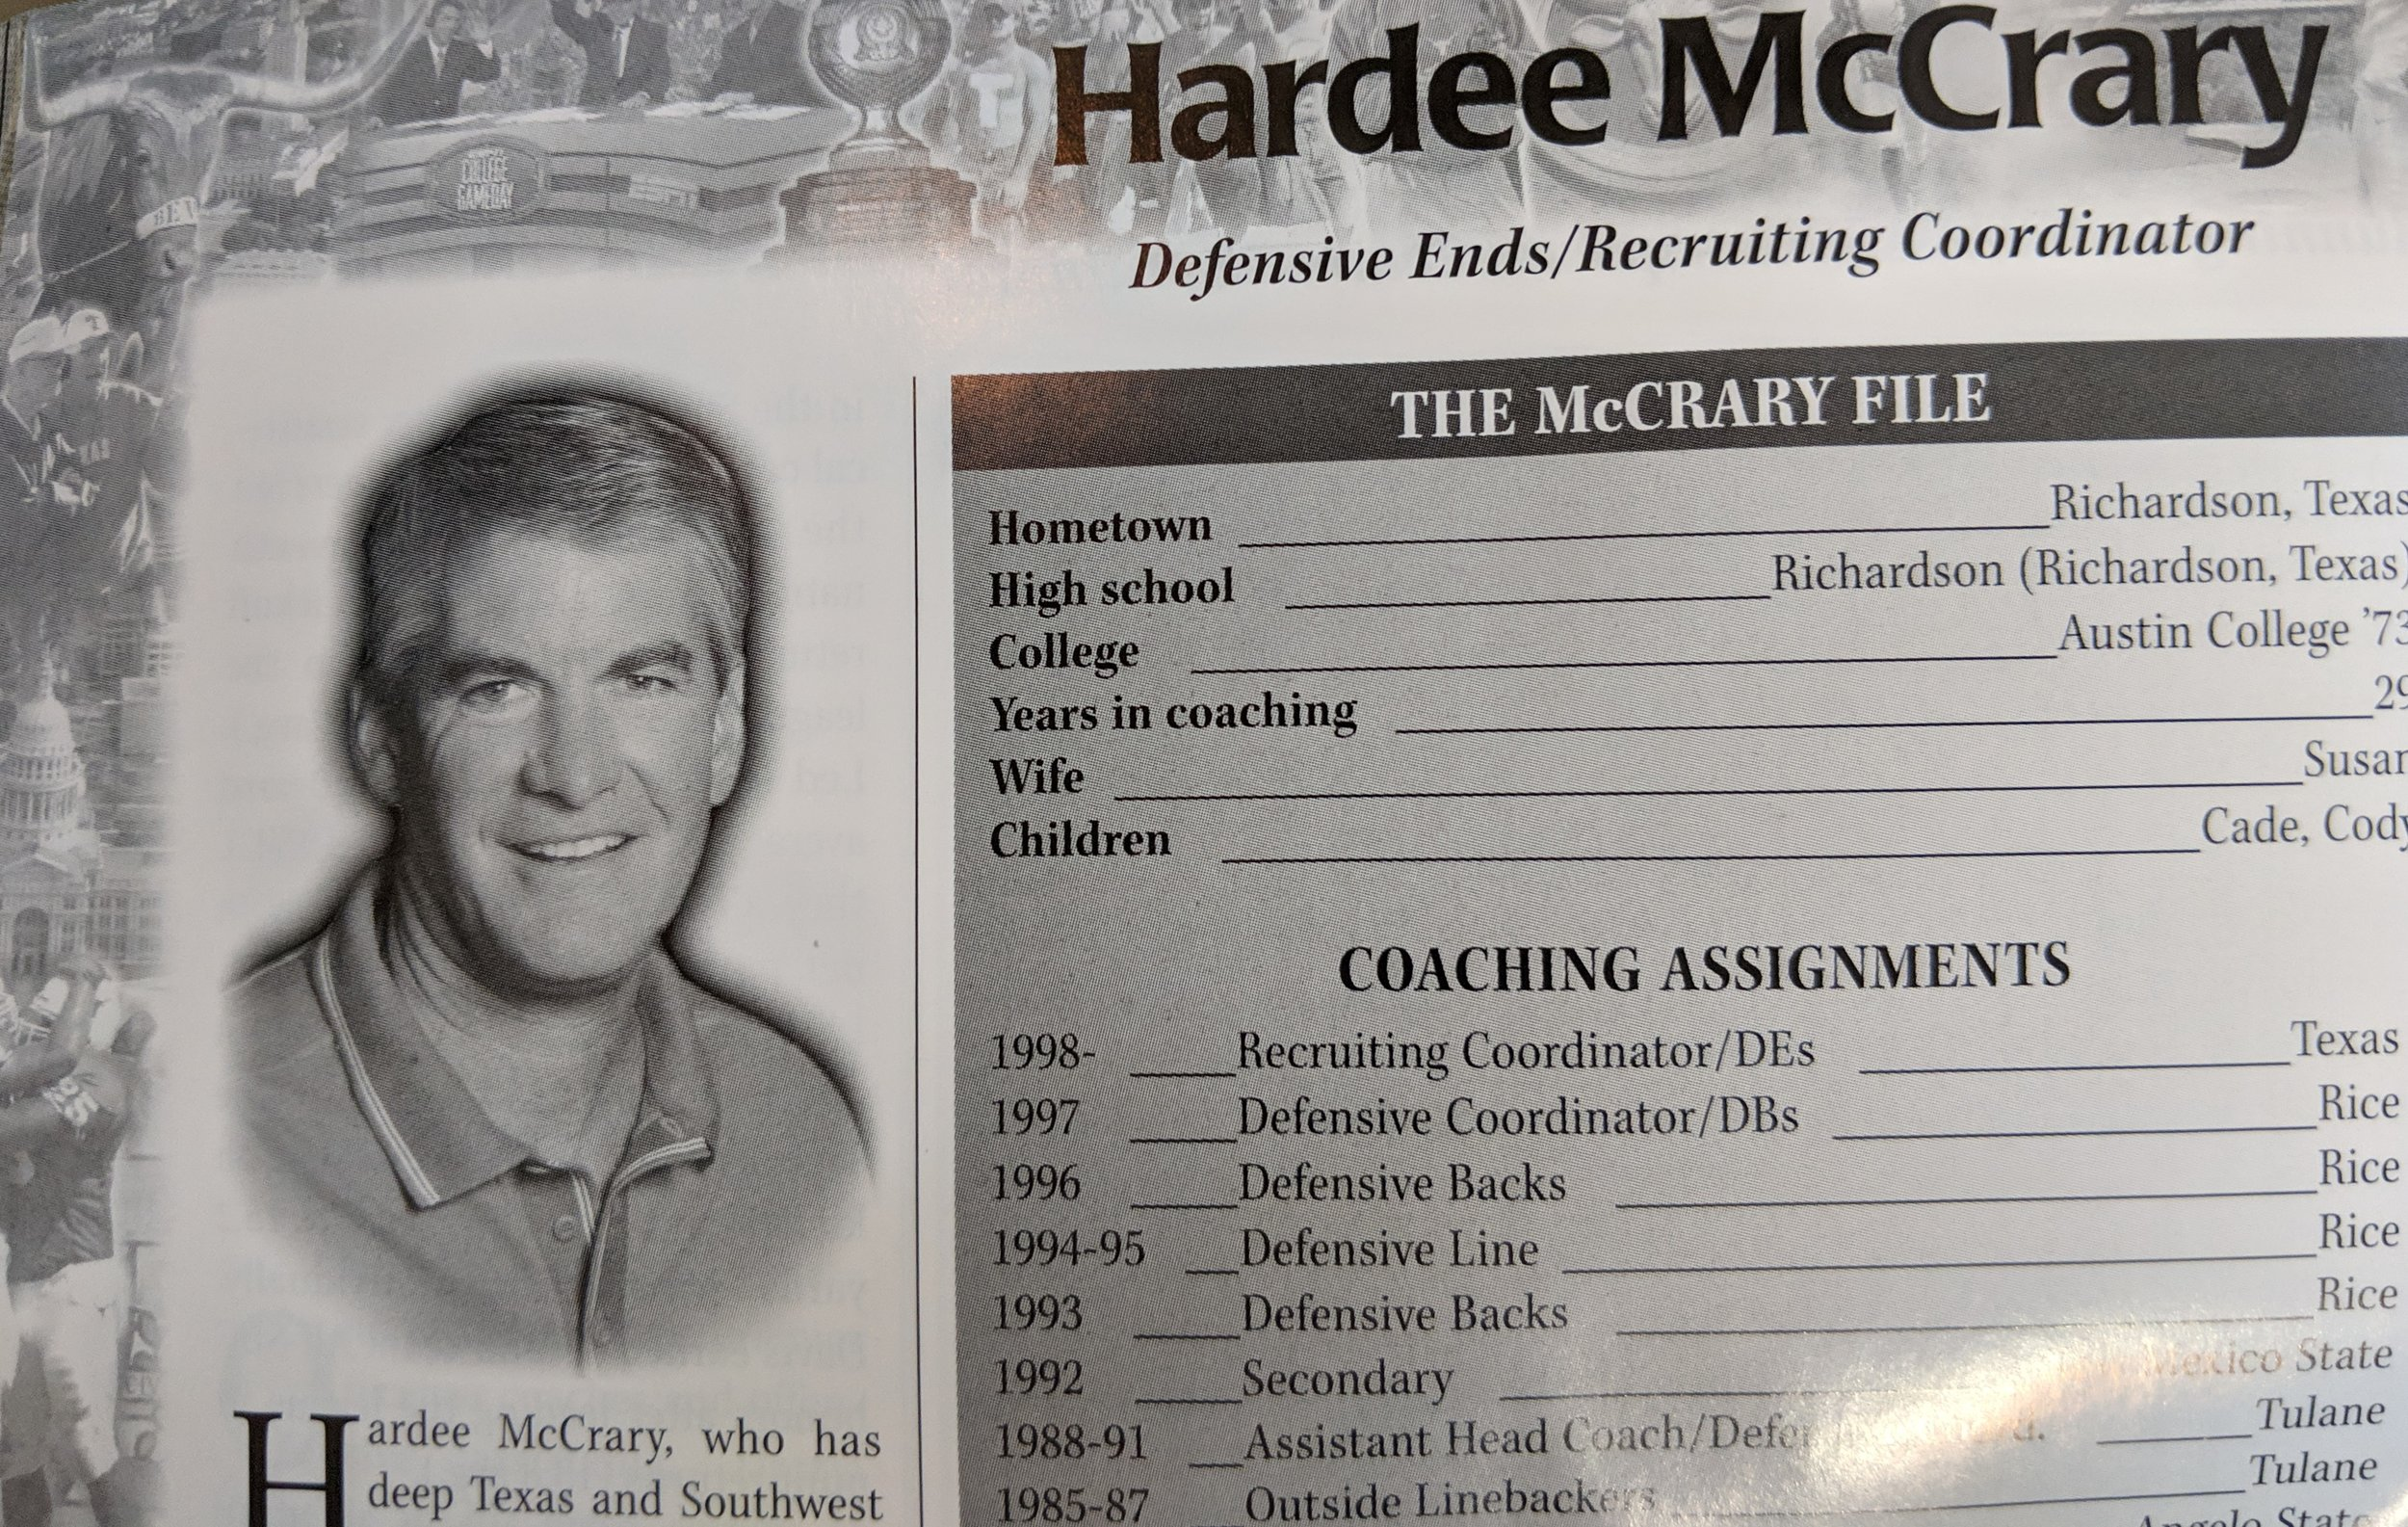 2003 Hardee McCrary .jpg